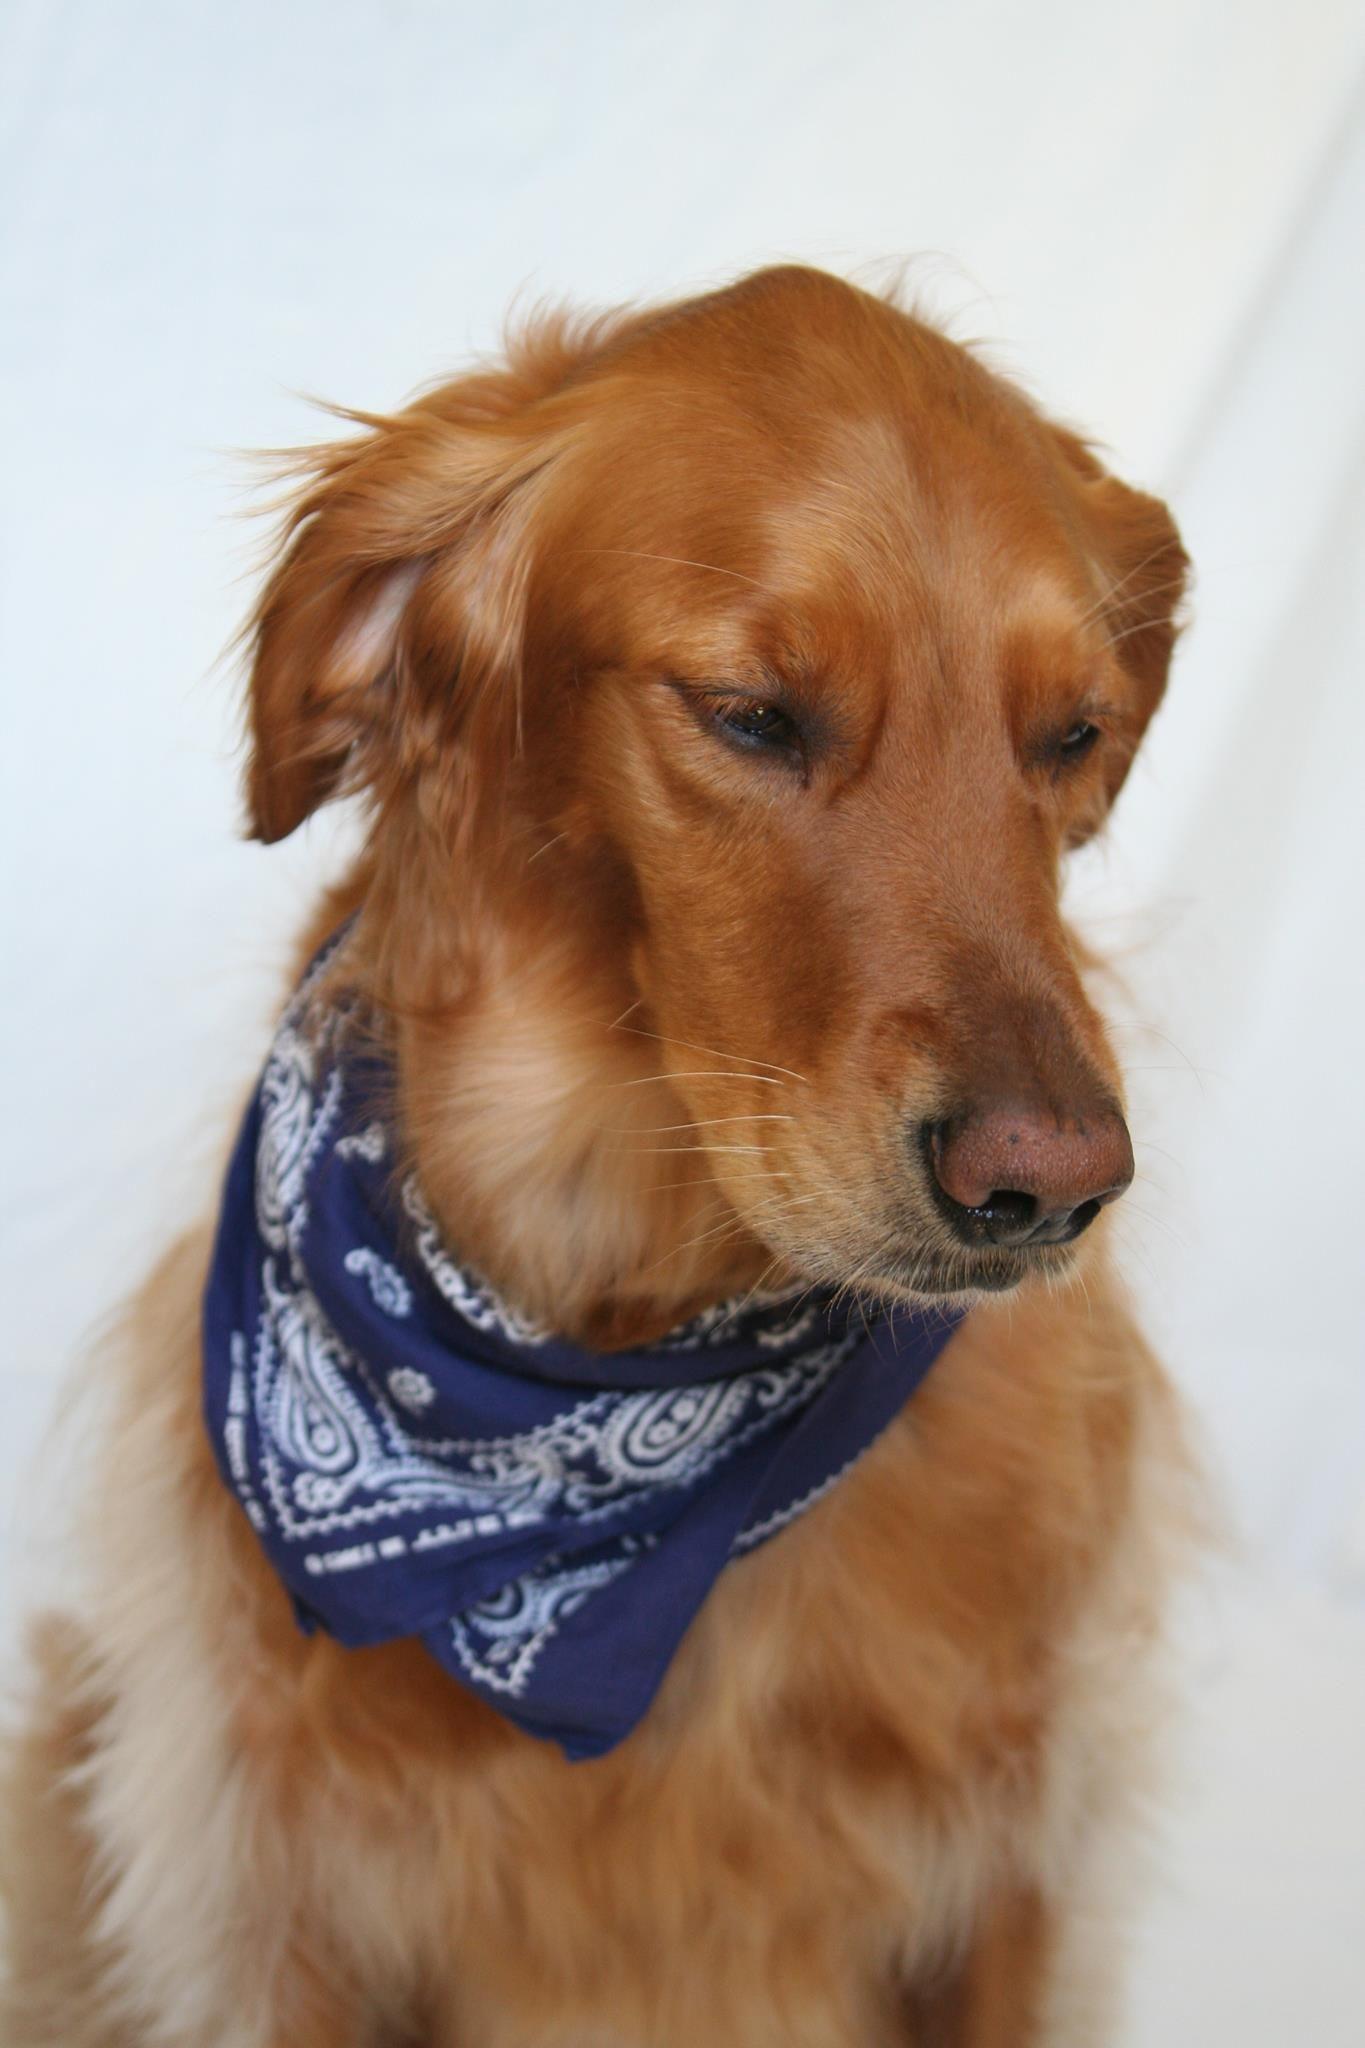 Glamour shot. Sadie the dog Dogs, Glamour shots, Animals